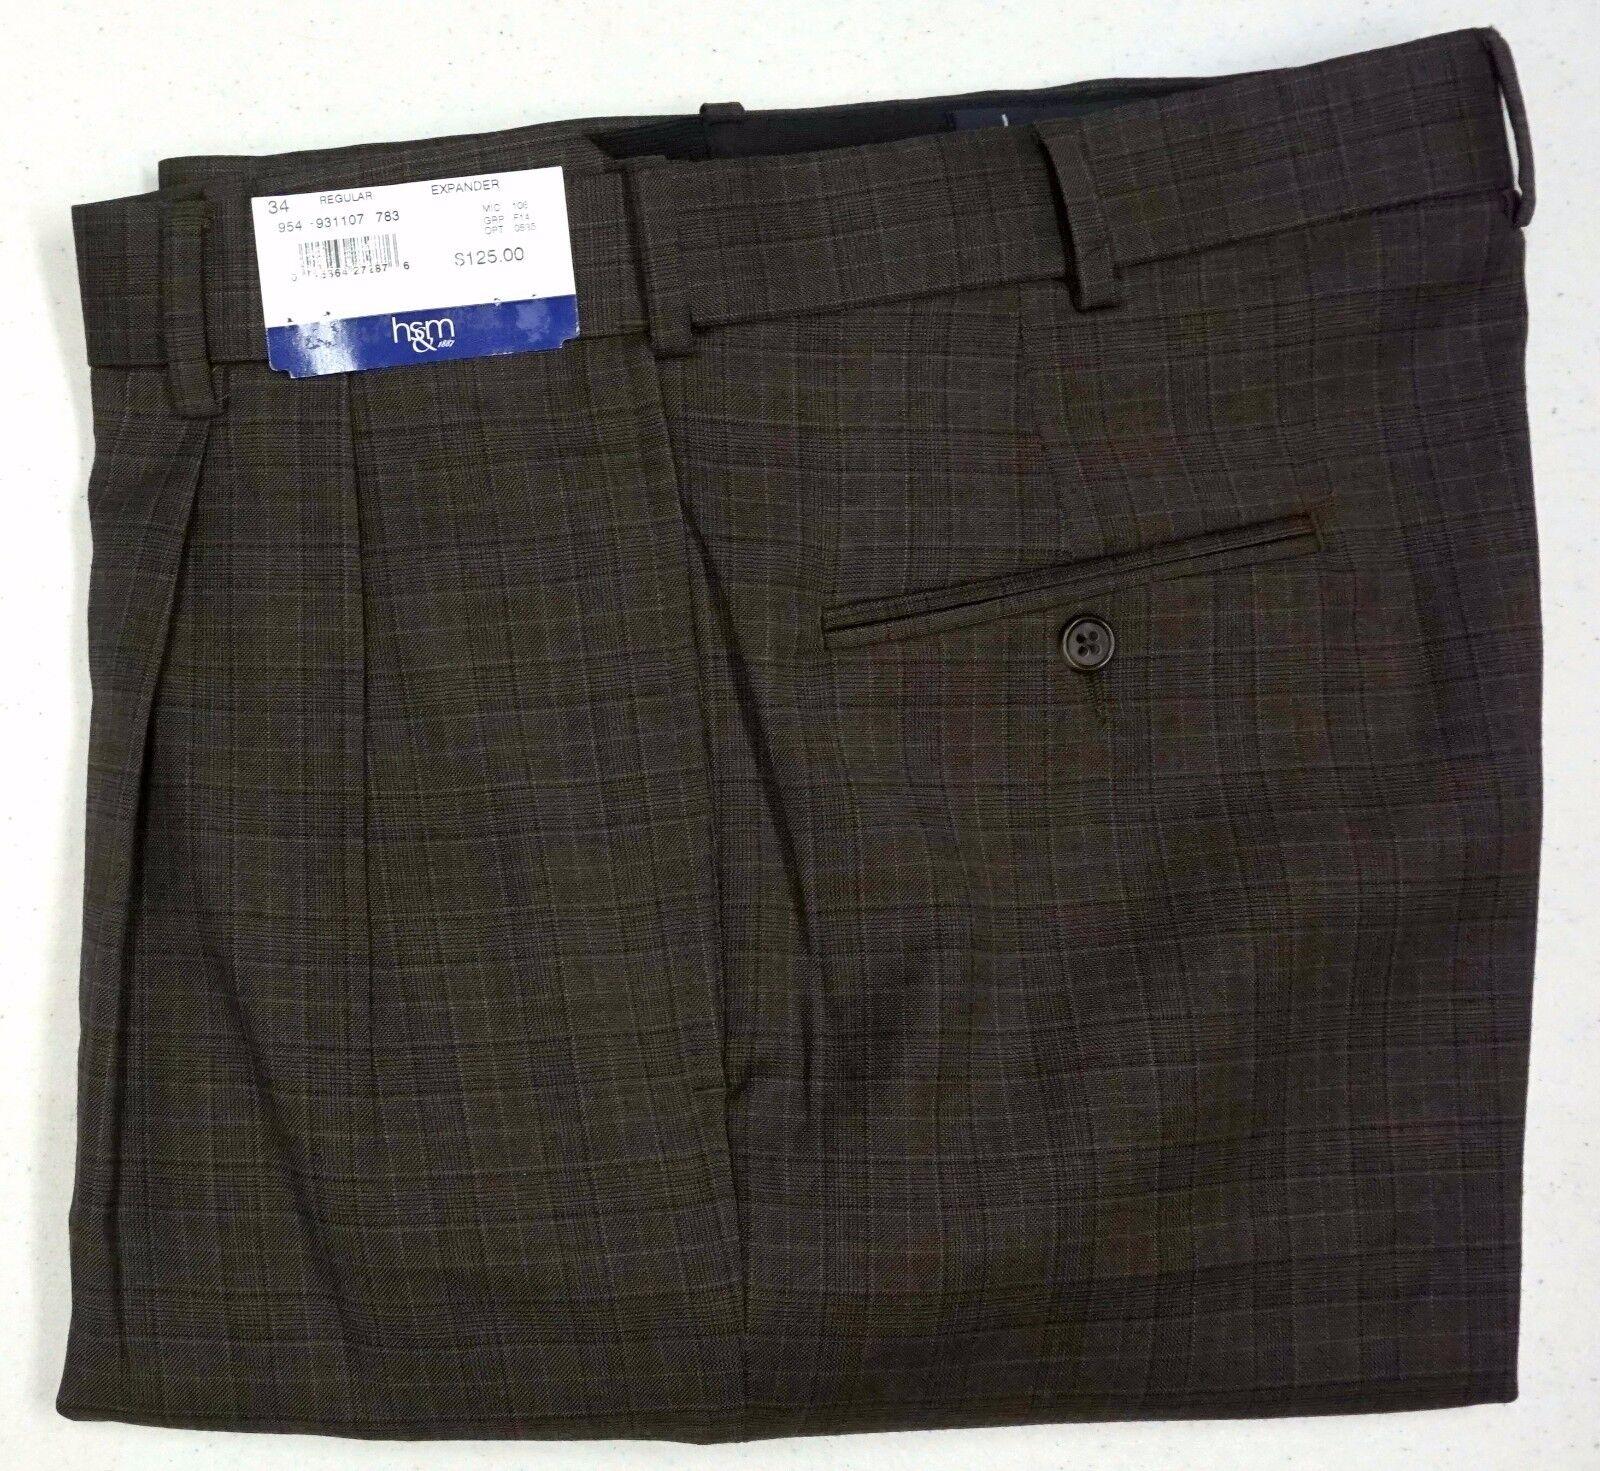 NWT  HART SCHAFFNER MARX EXPANDER PLAID BROWN DRESS PANTS PLEAT MENS 34R NEW